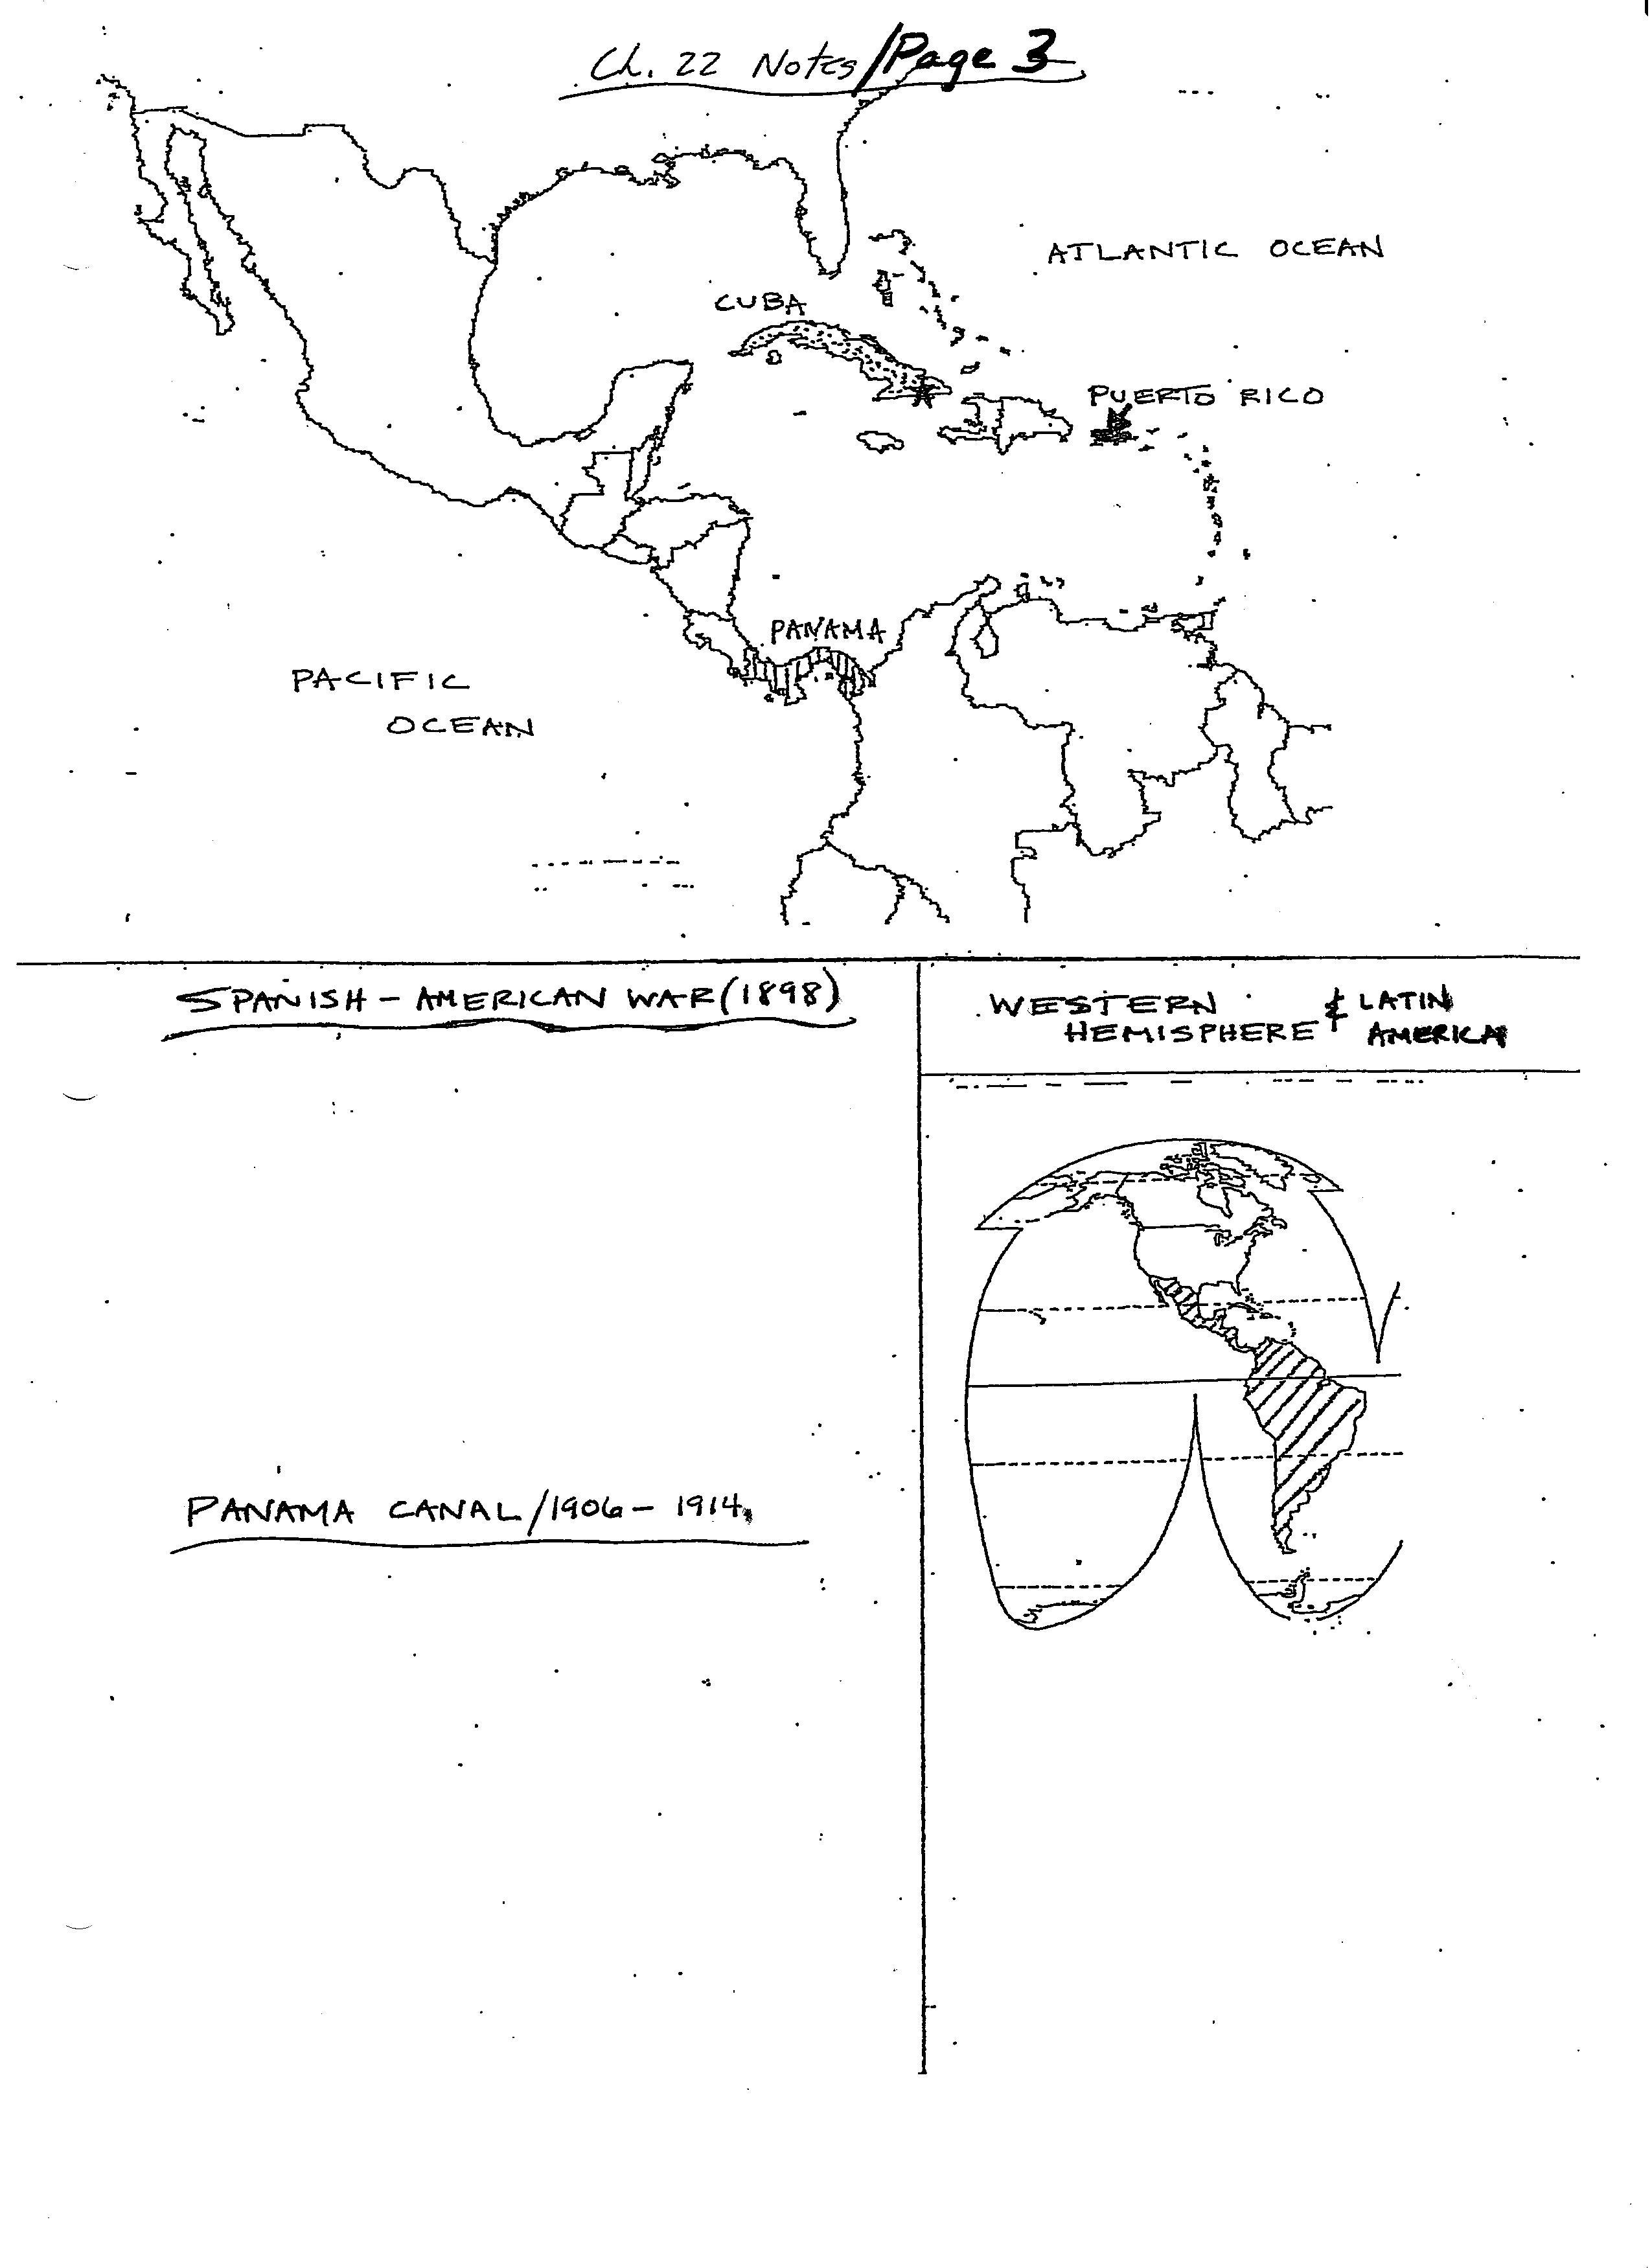 worksheet Spanish American War Worksheet worksheet art critique luizah strategy consultant cover spanish american war and